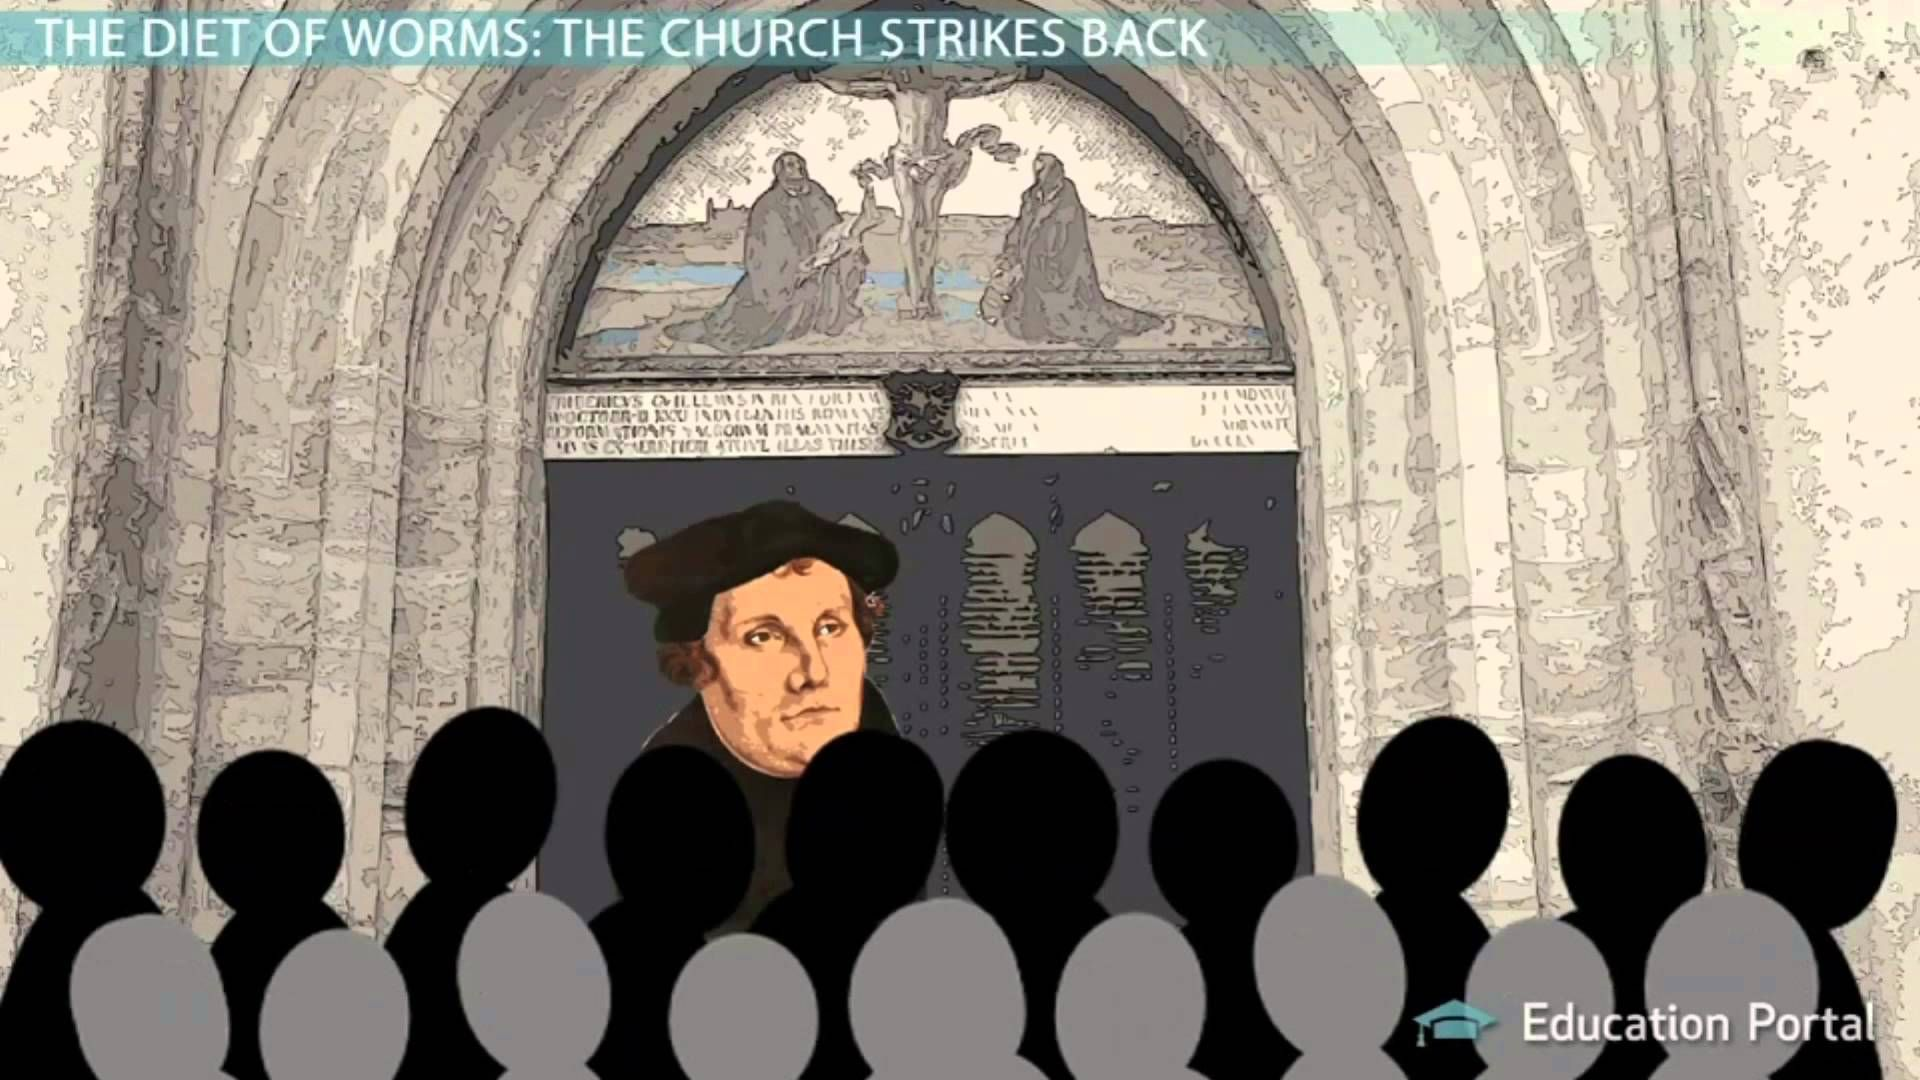 Reformaatio englanniksi